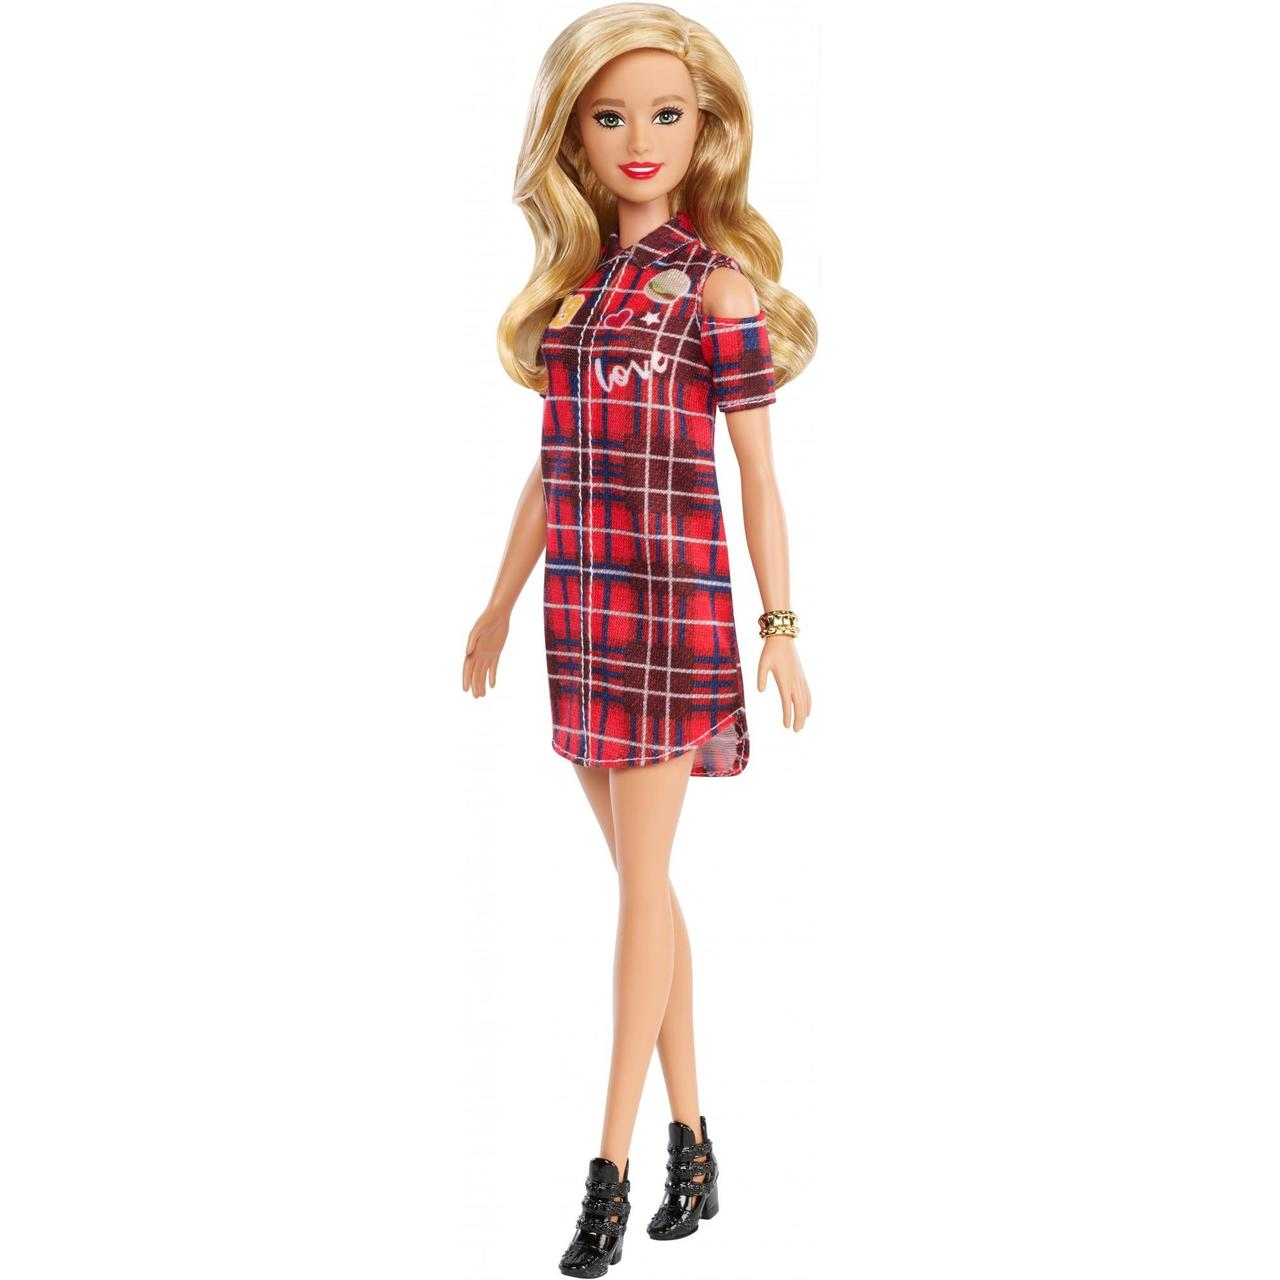 Кукла барби Фашионистас модница красное платье в клетку Barbie Fashionistas Plaid Dress блондинка